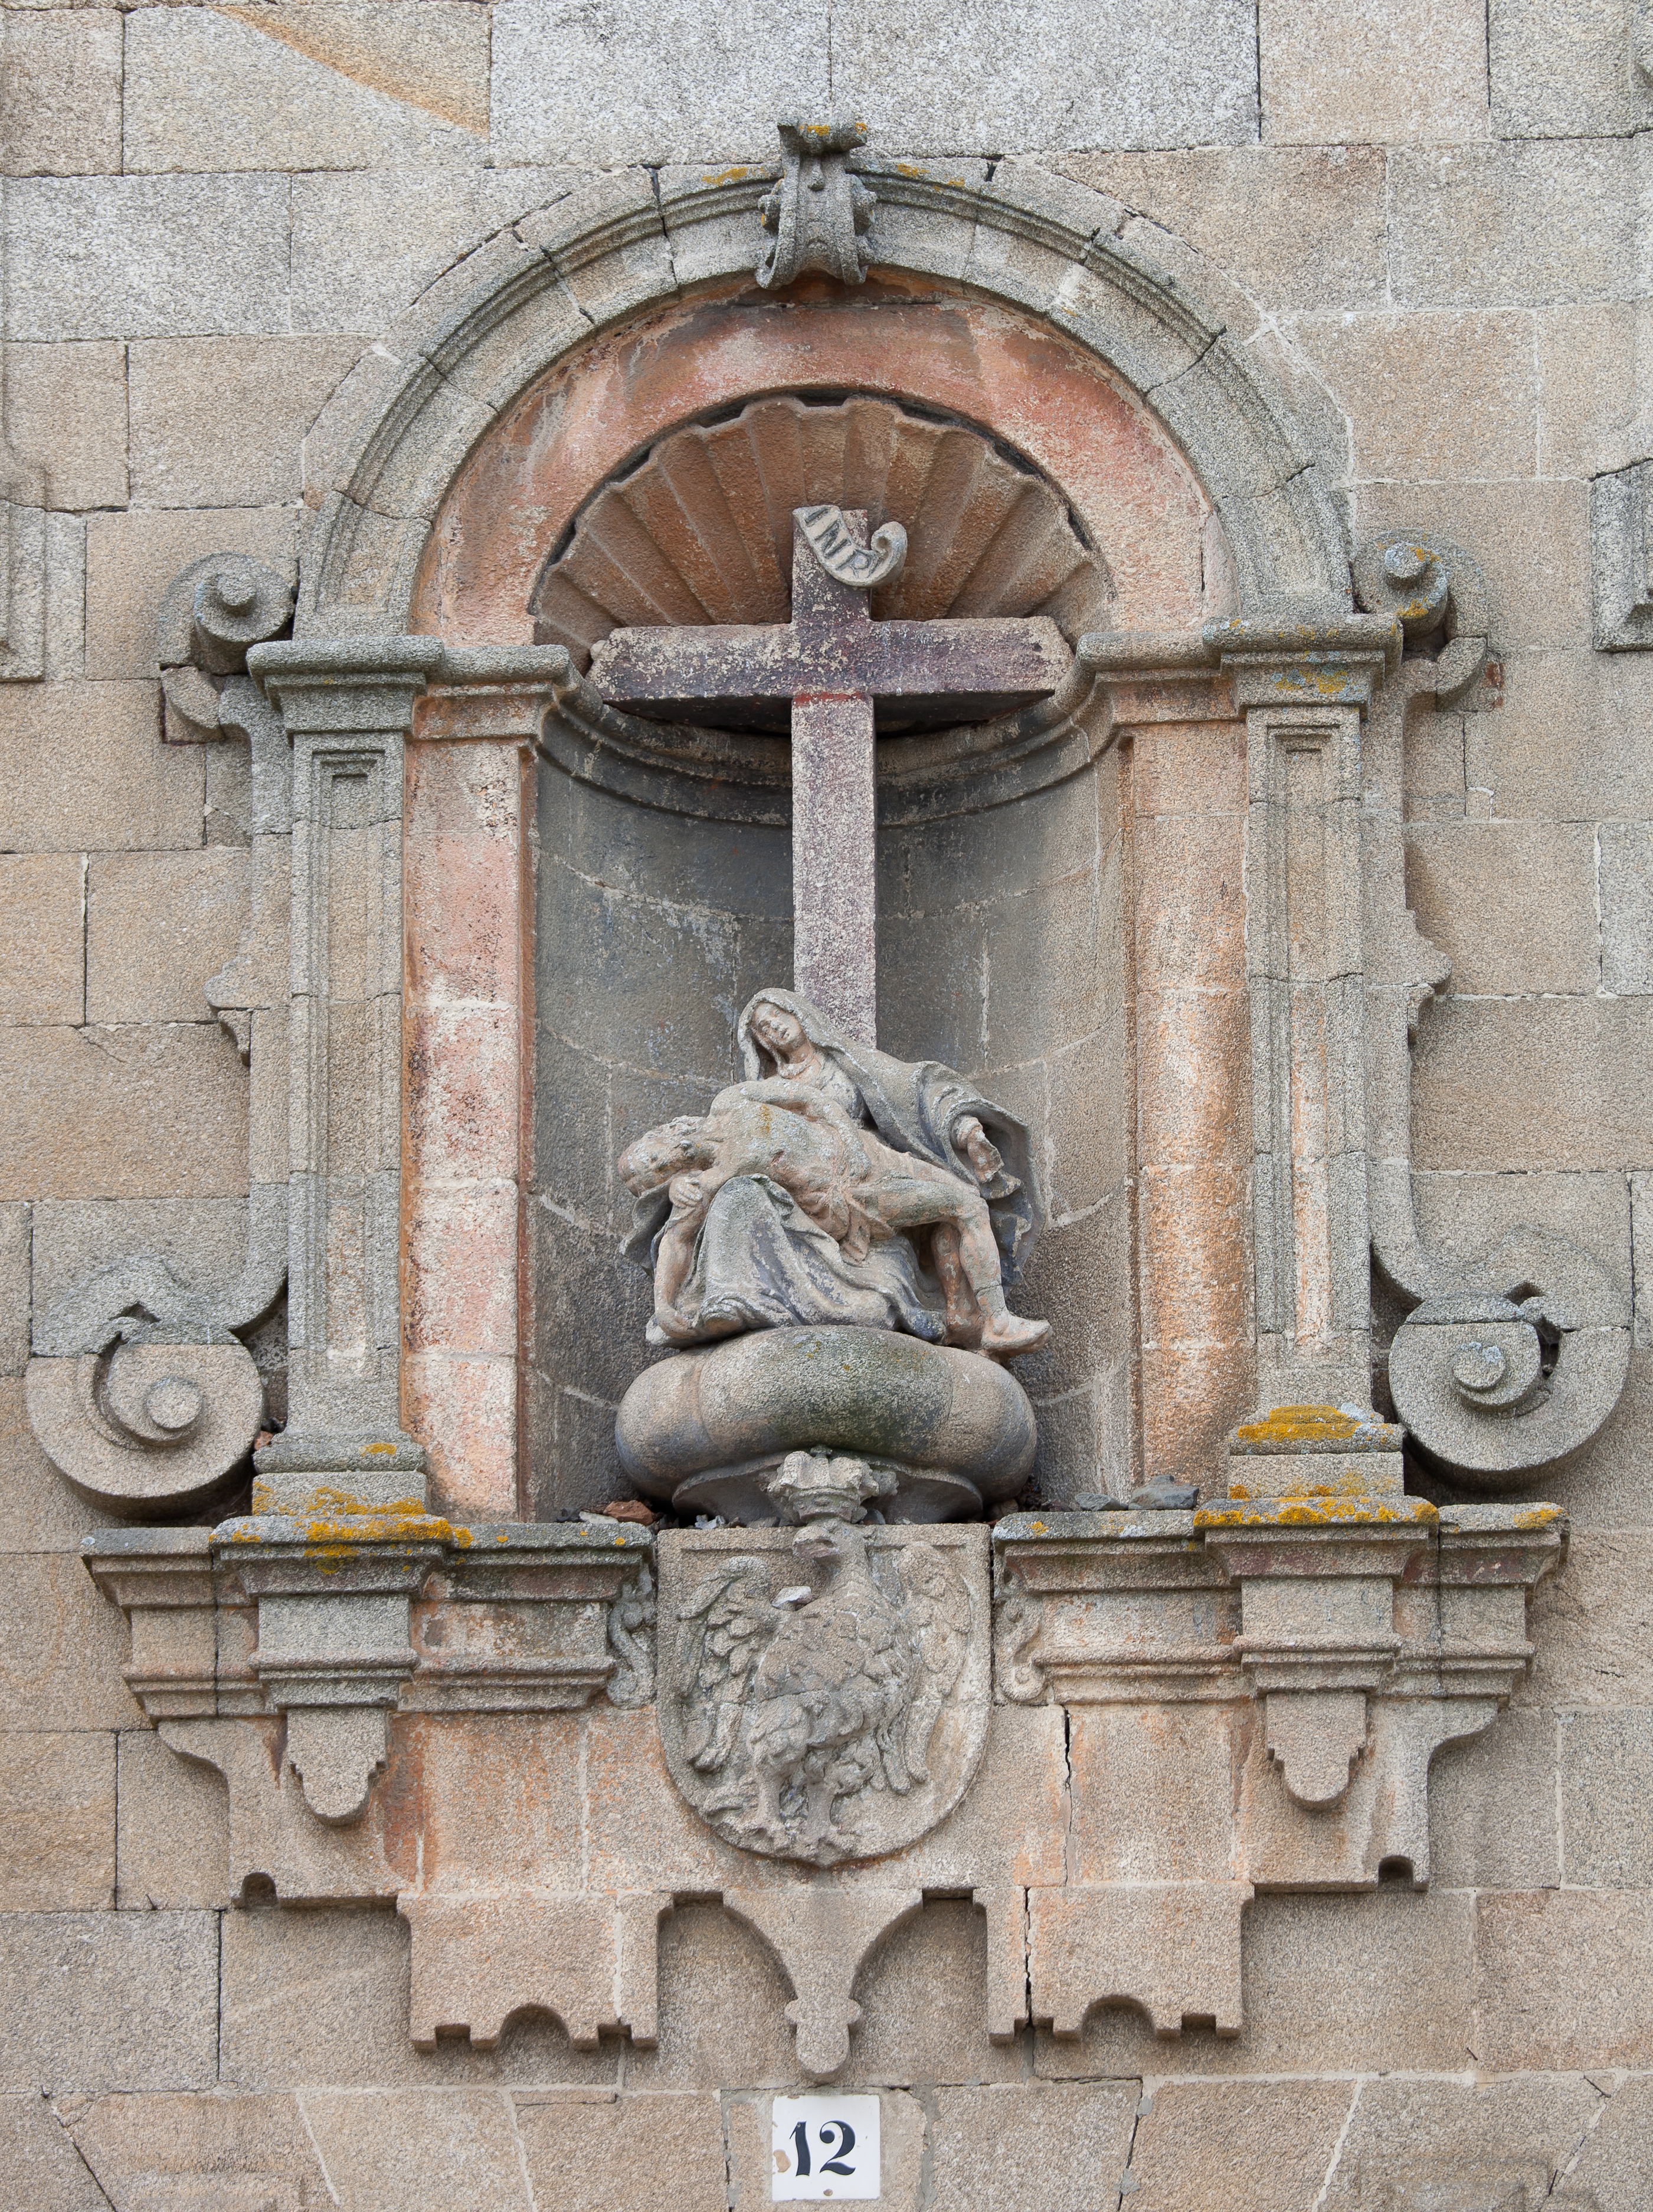 Sanctuary of A Angustia, Betanzos, Galicia (Spain)